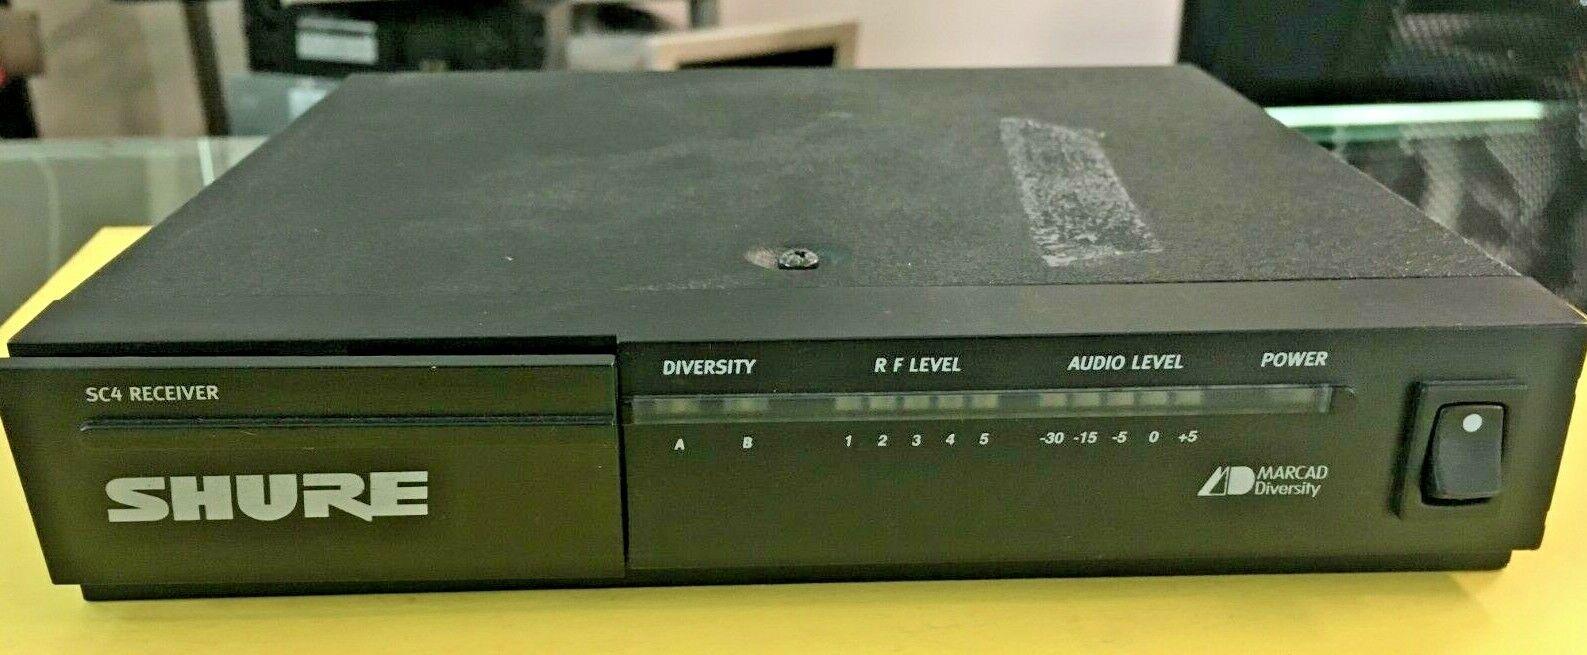 Shure SC4 CT Marcad Diversity senza Fili Ricevitore 206 mhz